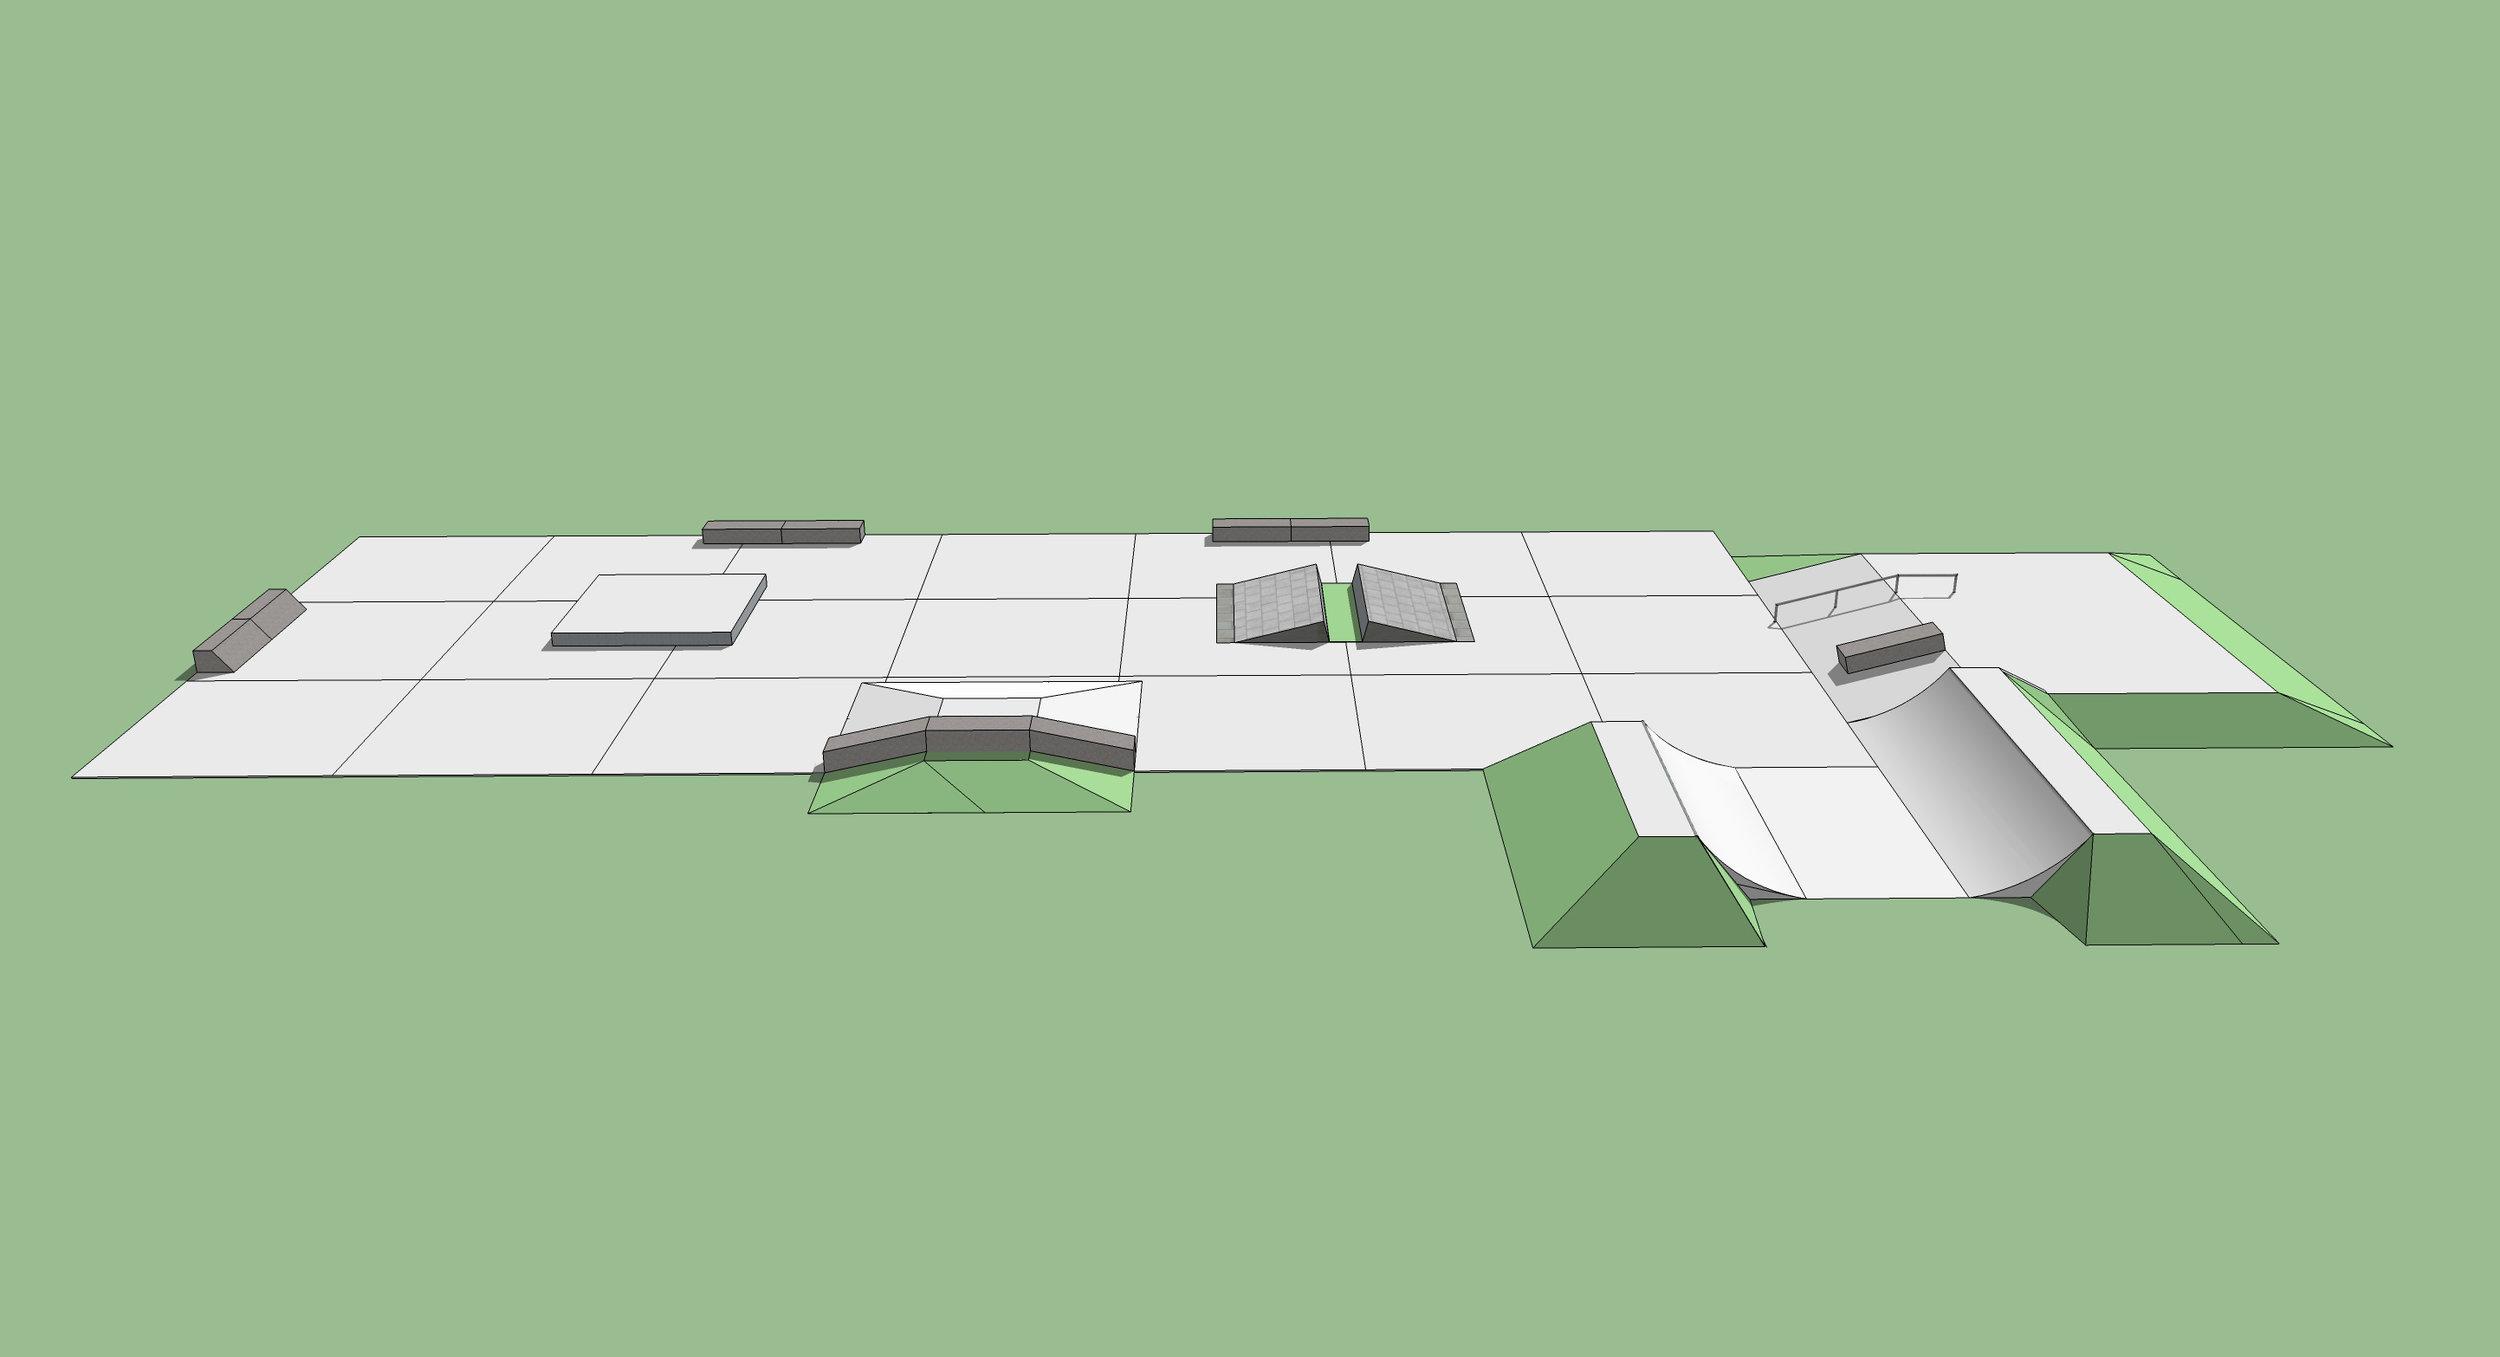 SKATE-ARCHITECTS-NAVARCLES-Skateplaza-Arquitectura-161215-notrees-22.jpg